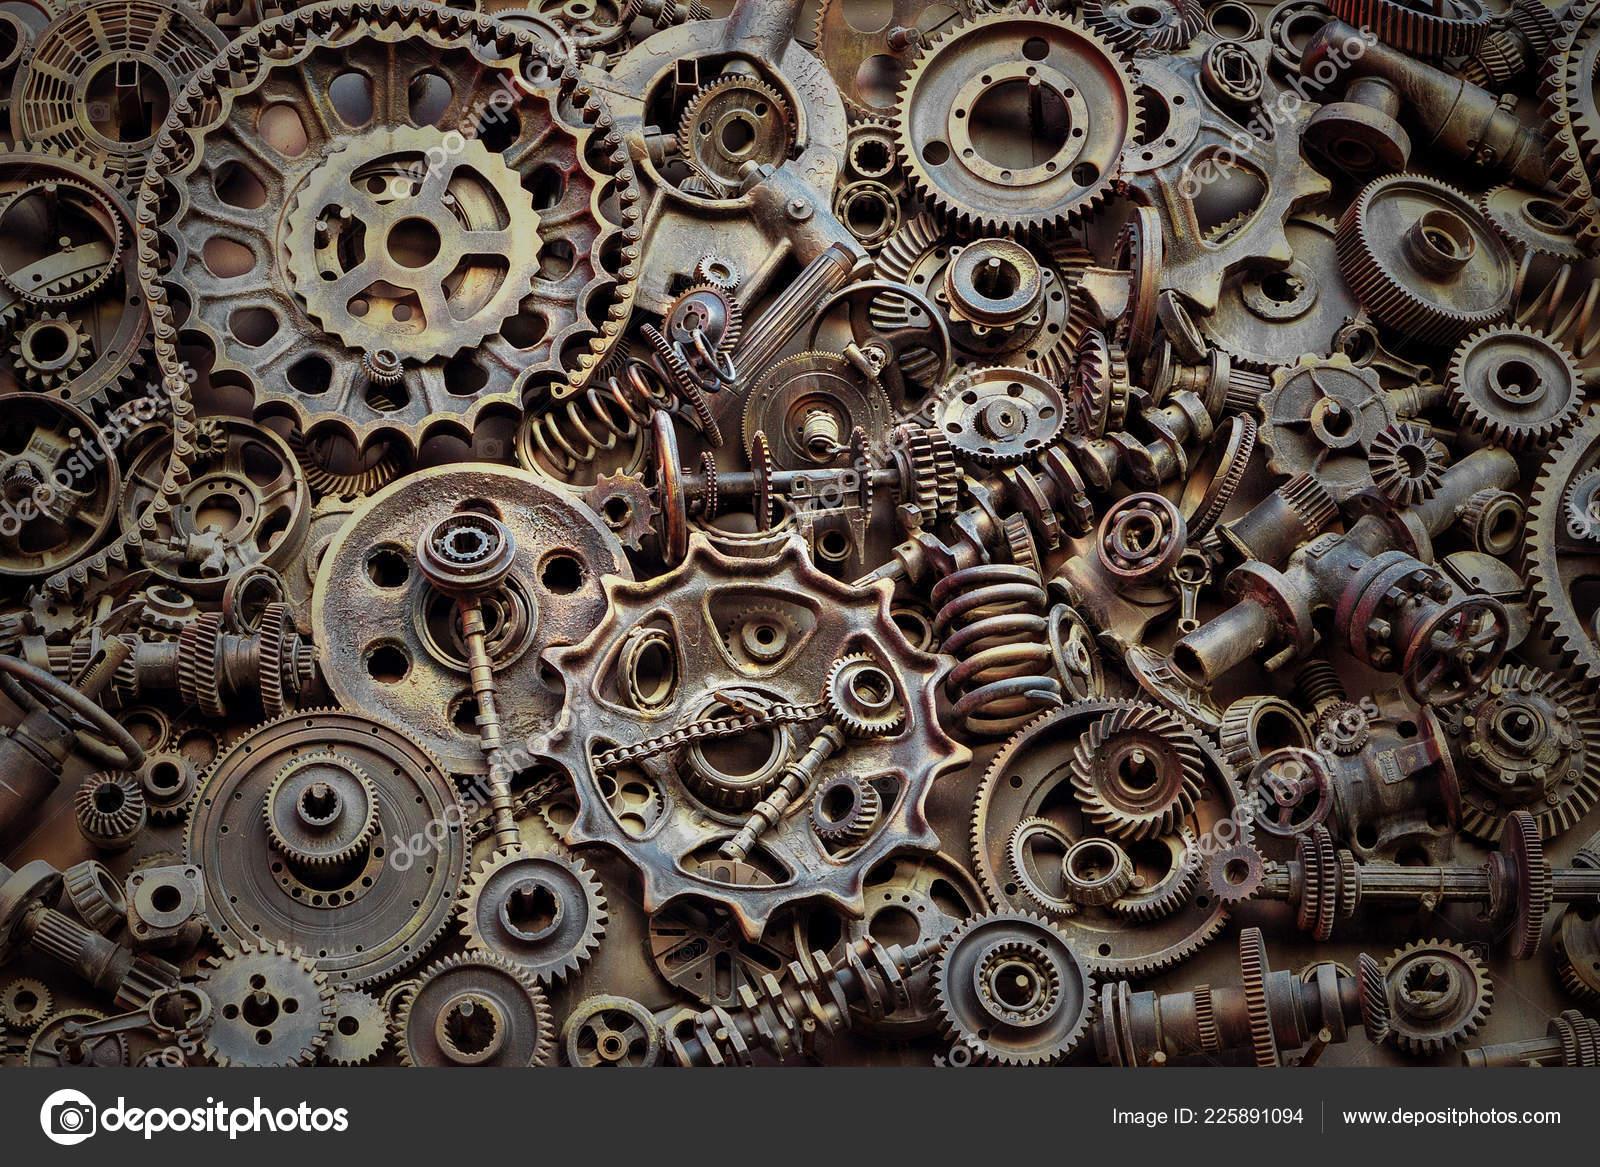 steampunk background machine parts large gears chains machines